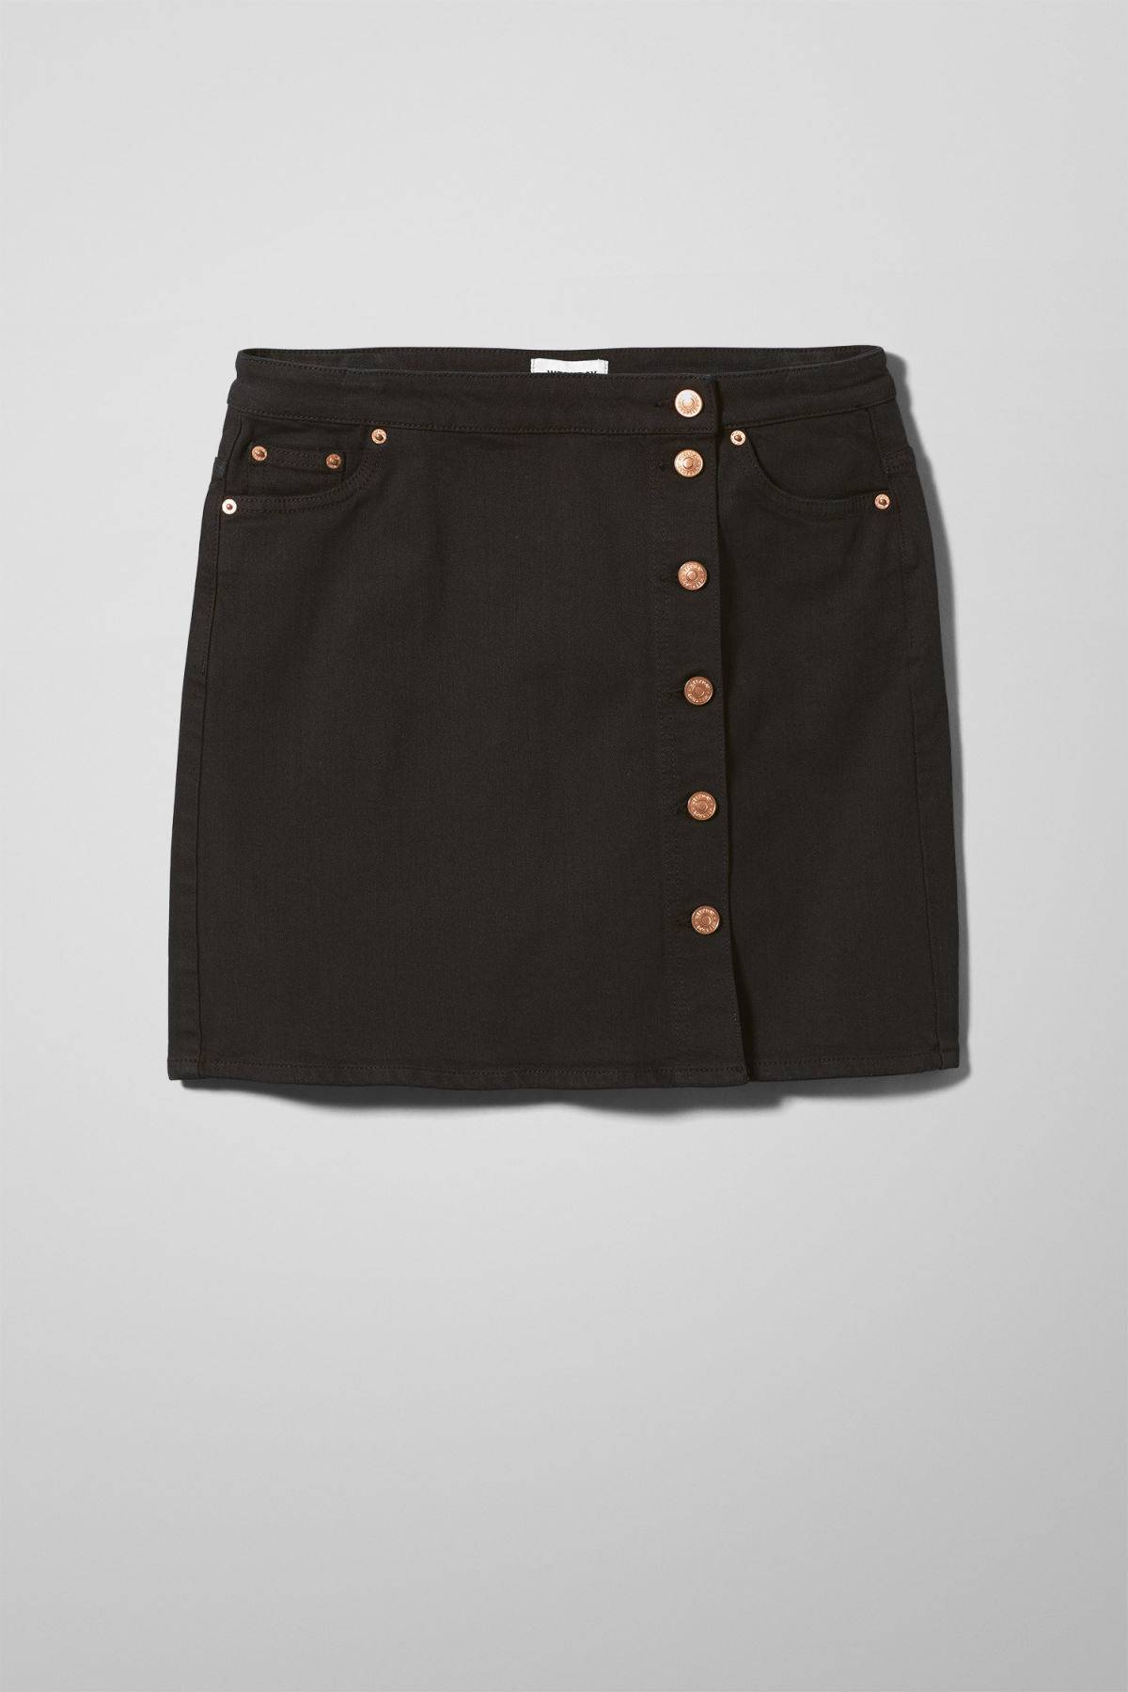 Sax Denim Skirt - Black